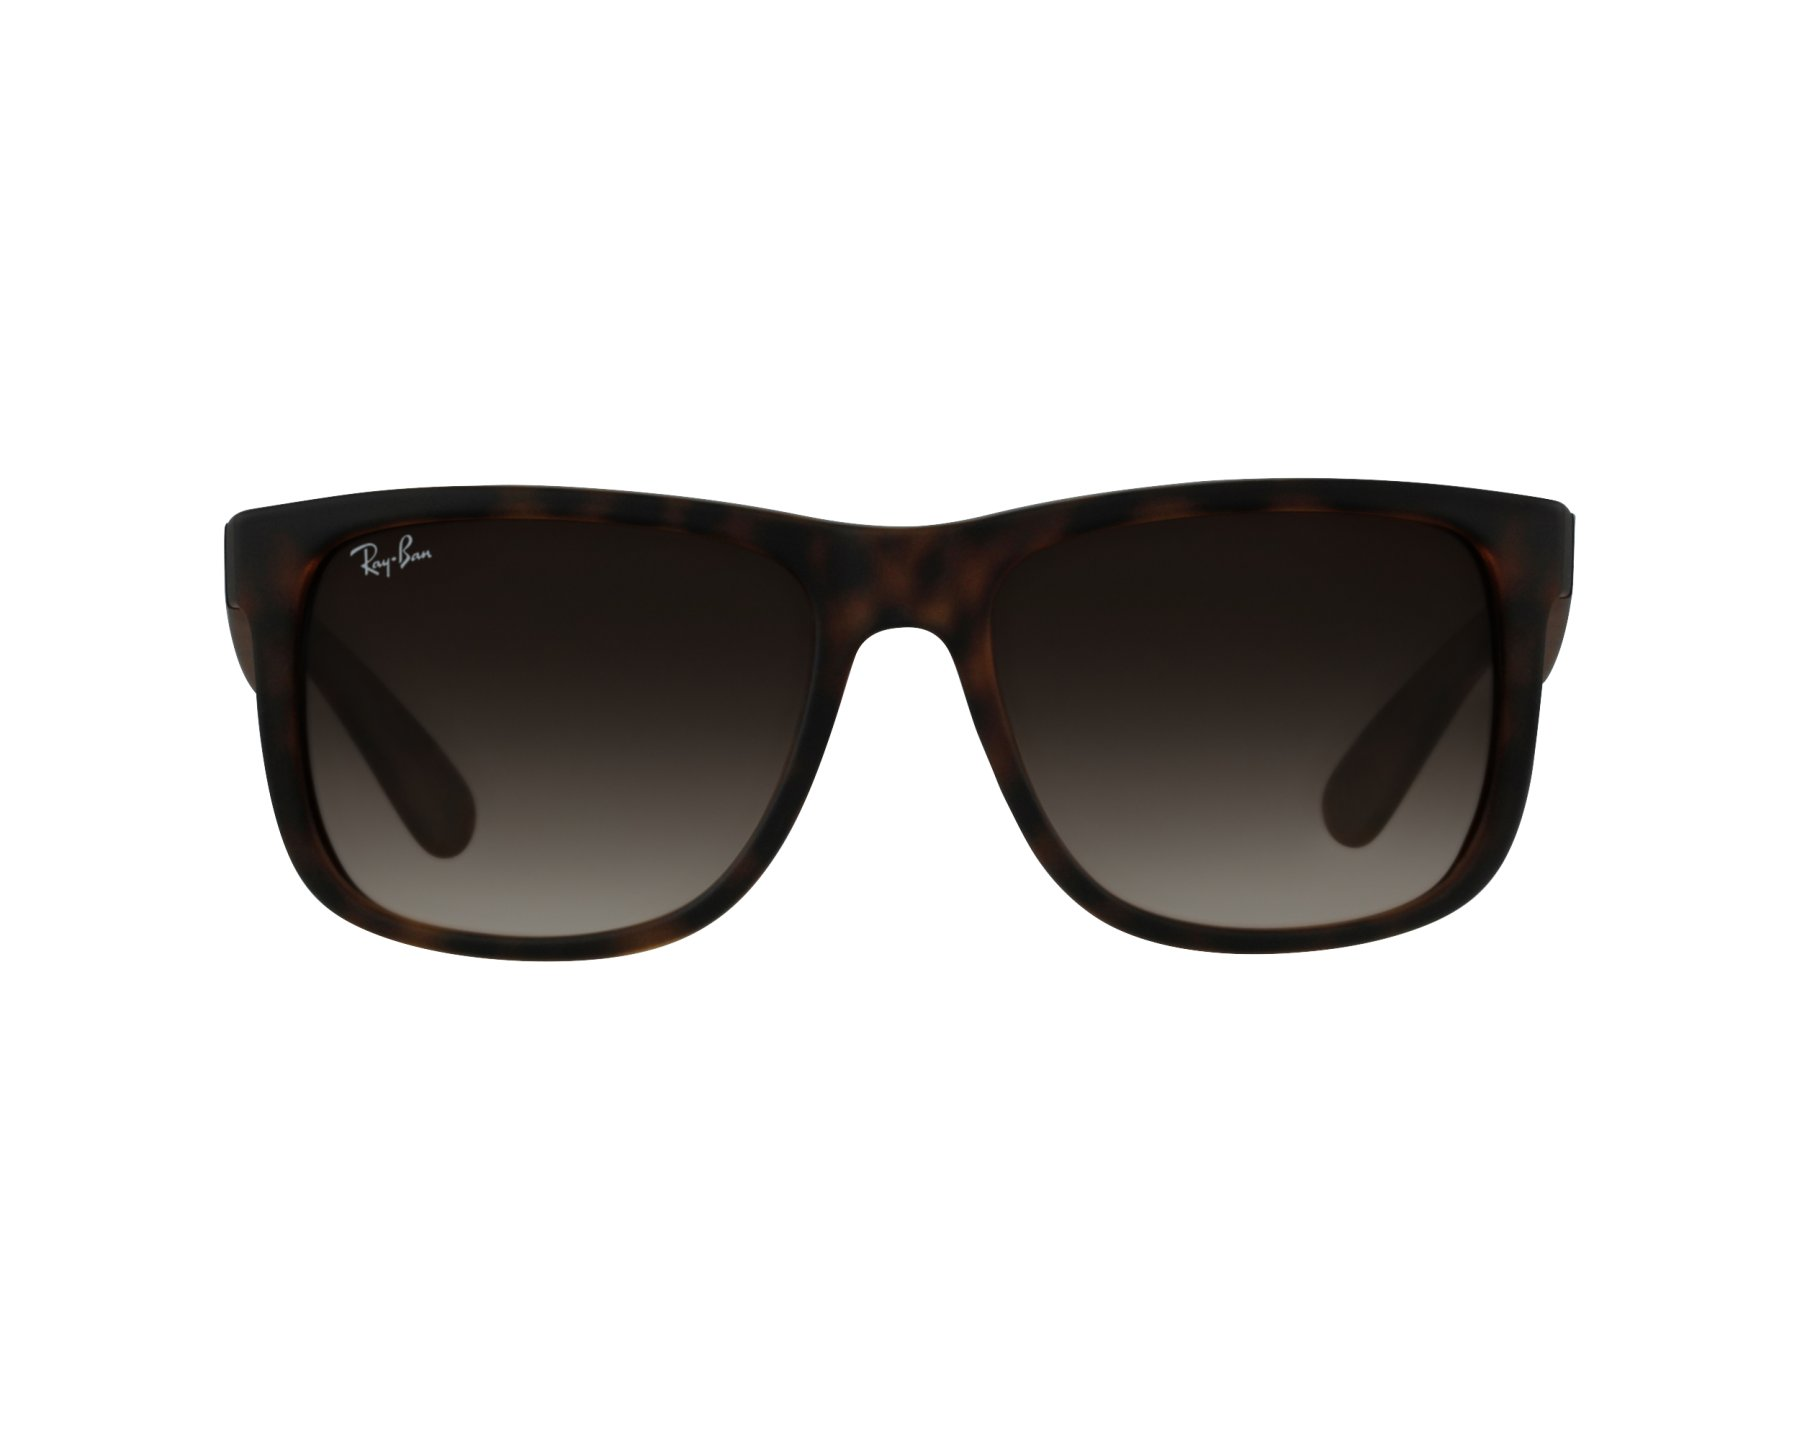 lunettes de soleil ray ban rb 4165 710 13 havane avec des verres marron. Black Bedroom Furniture Sets. Home Design Ideas